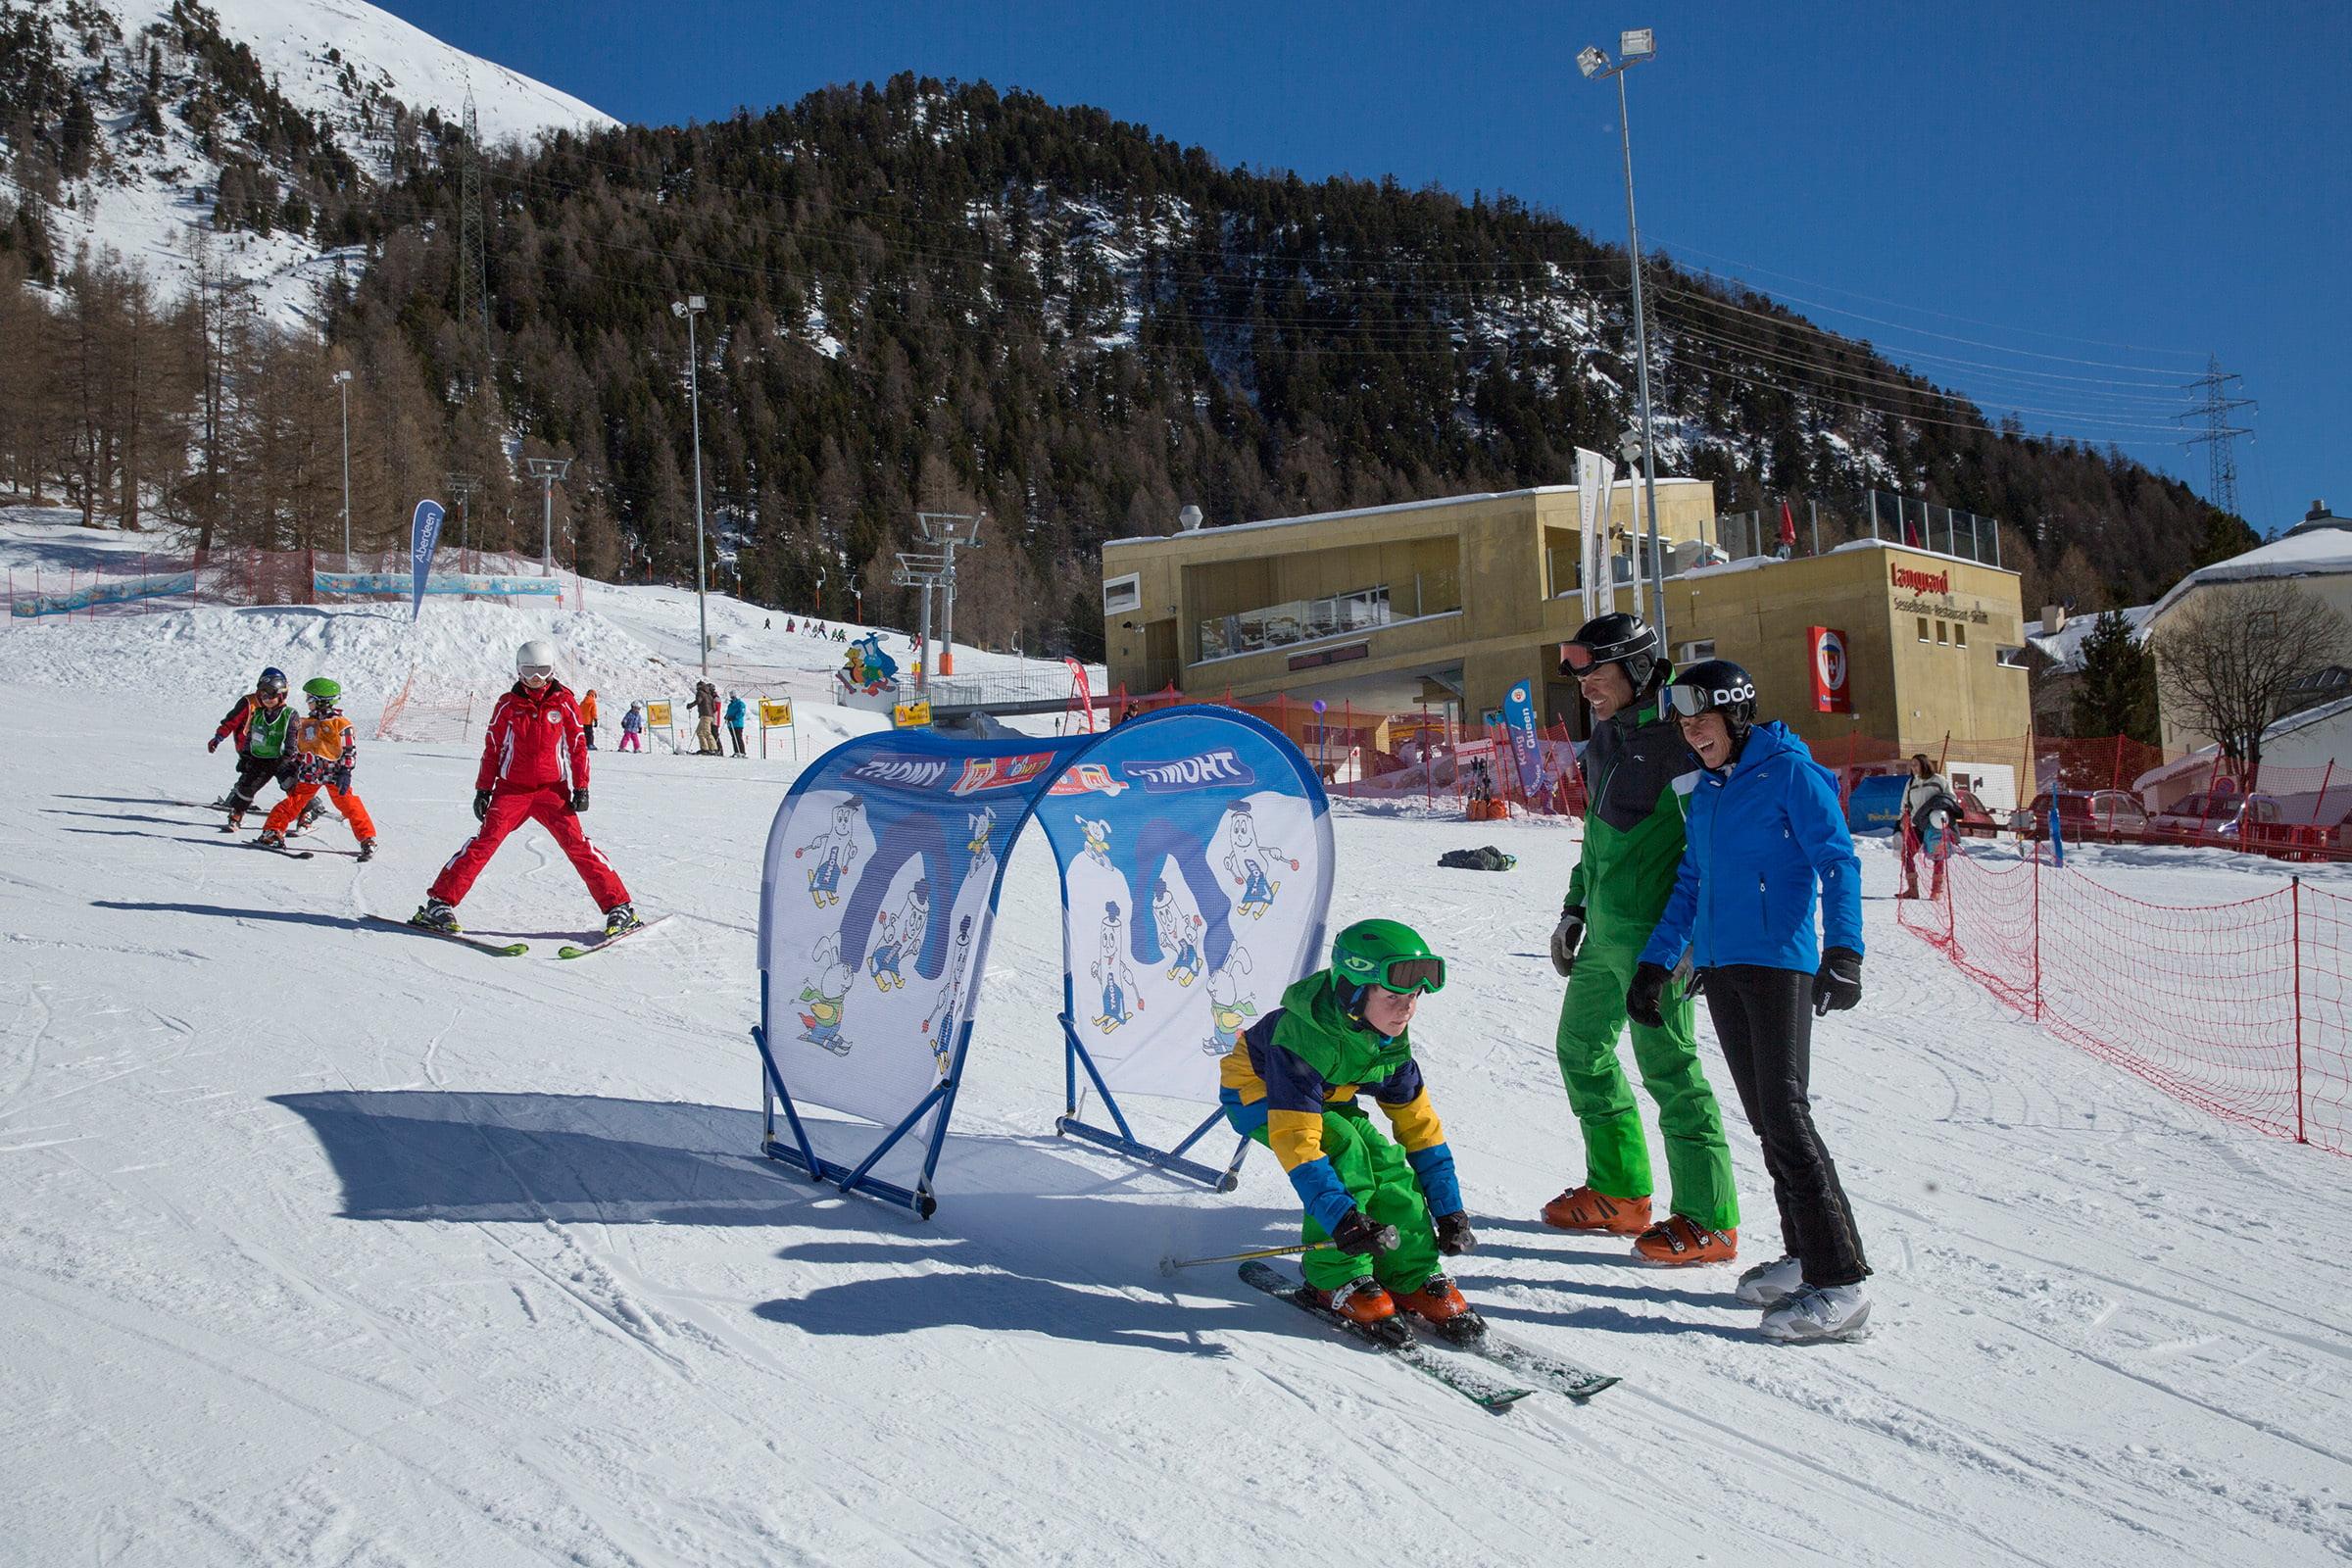 Languard family ski area